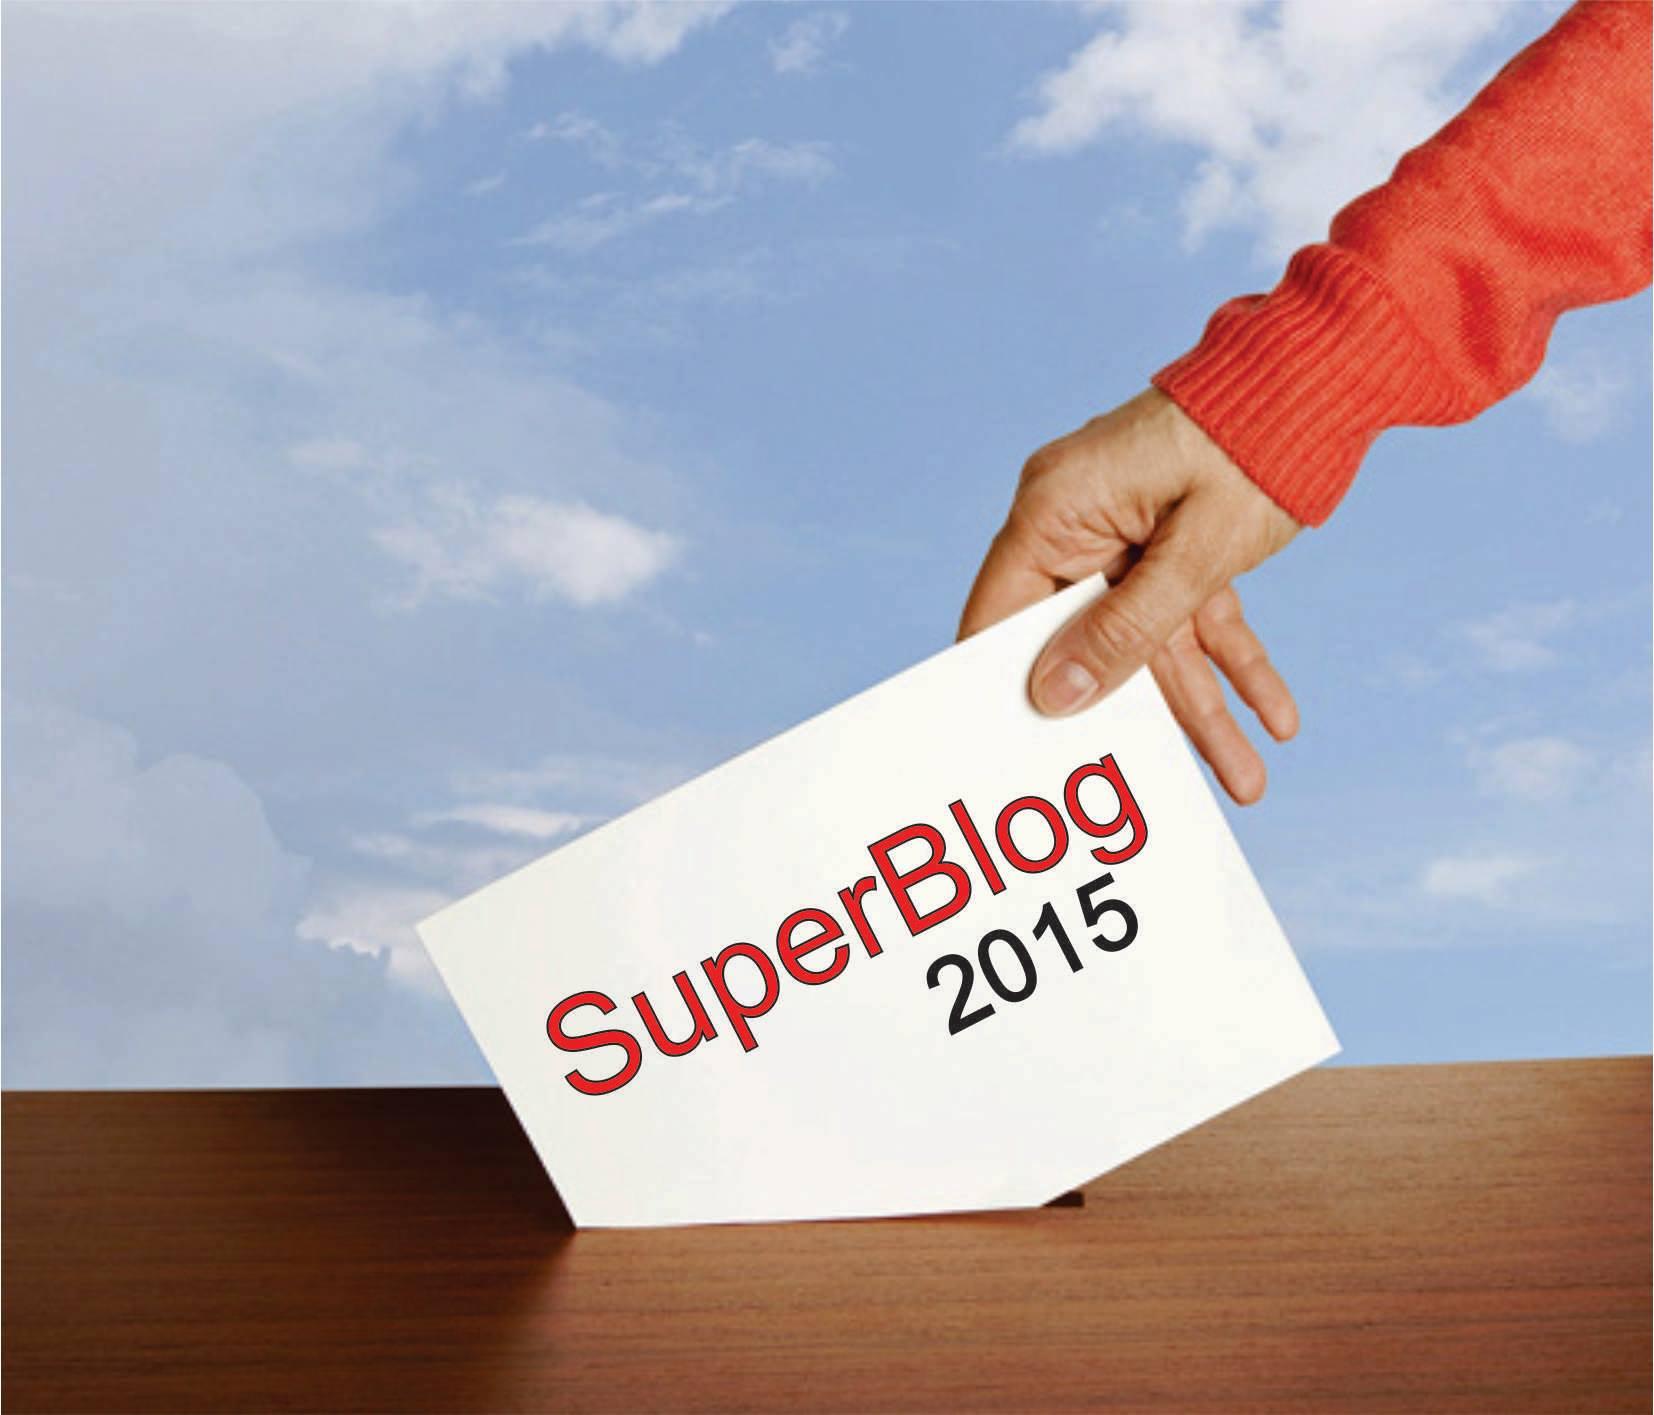 Proba 24. Votați SuperBlog!